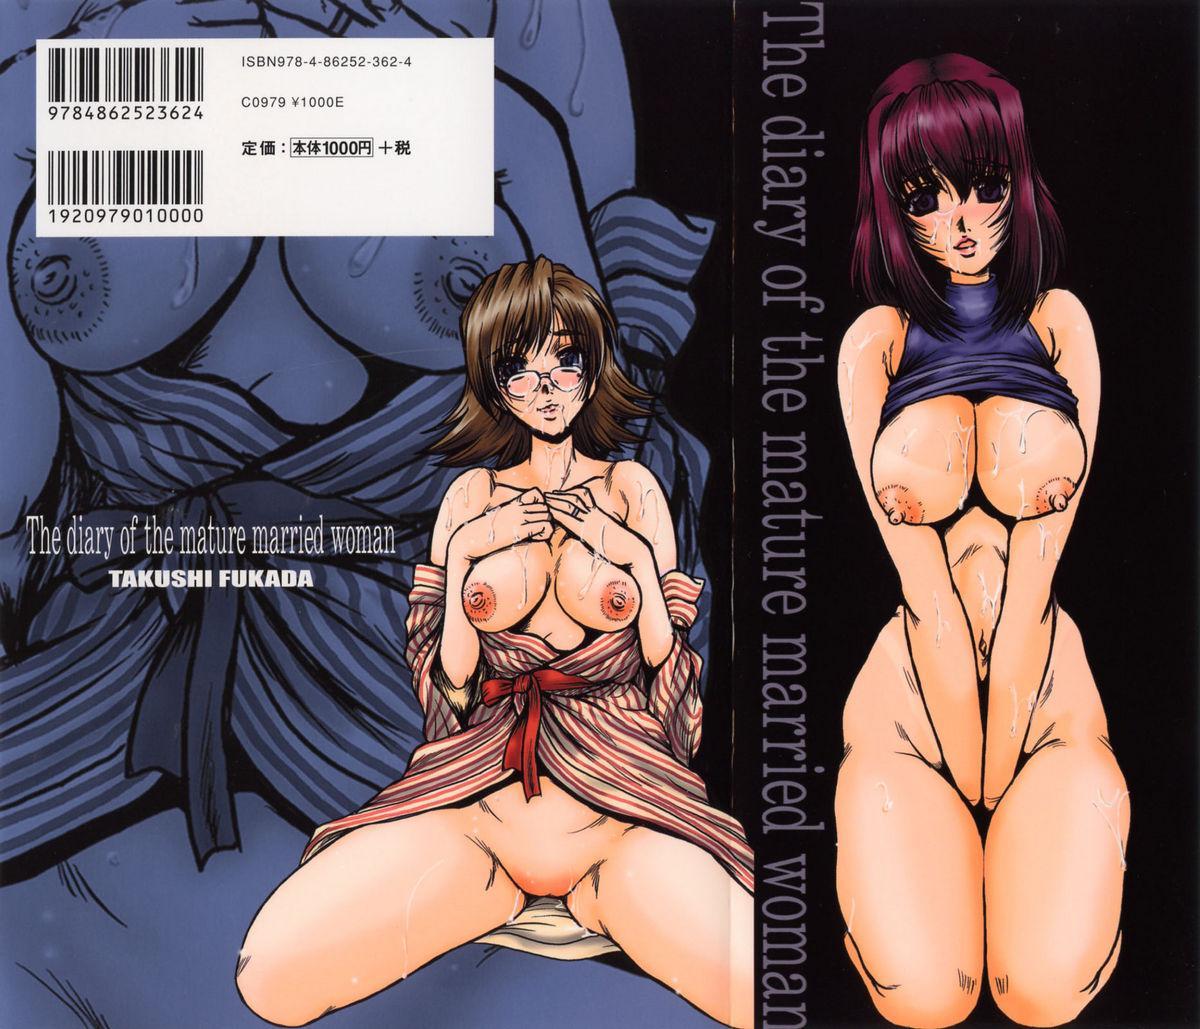 Kanjuku Hitozuma Nikki - The diary of the mature married woman 1